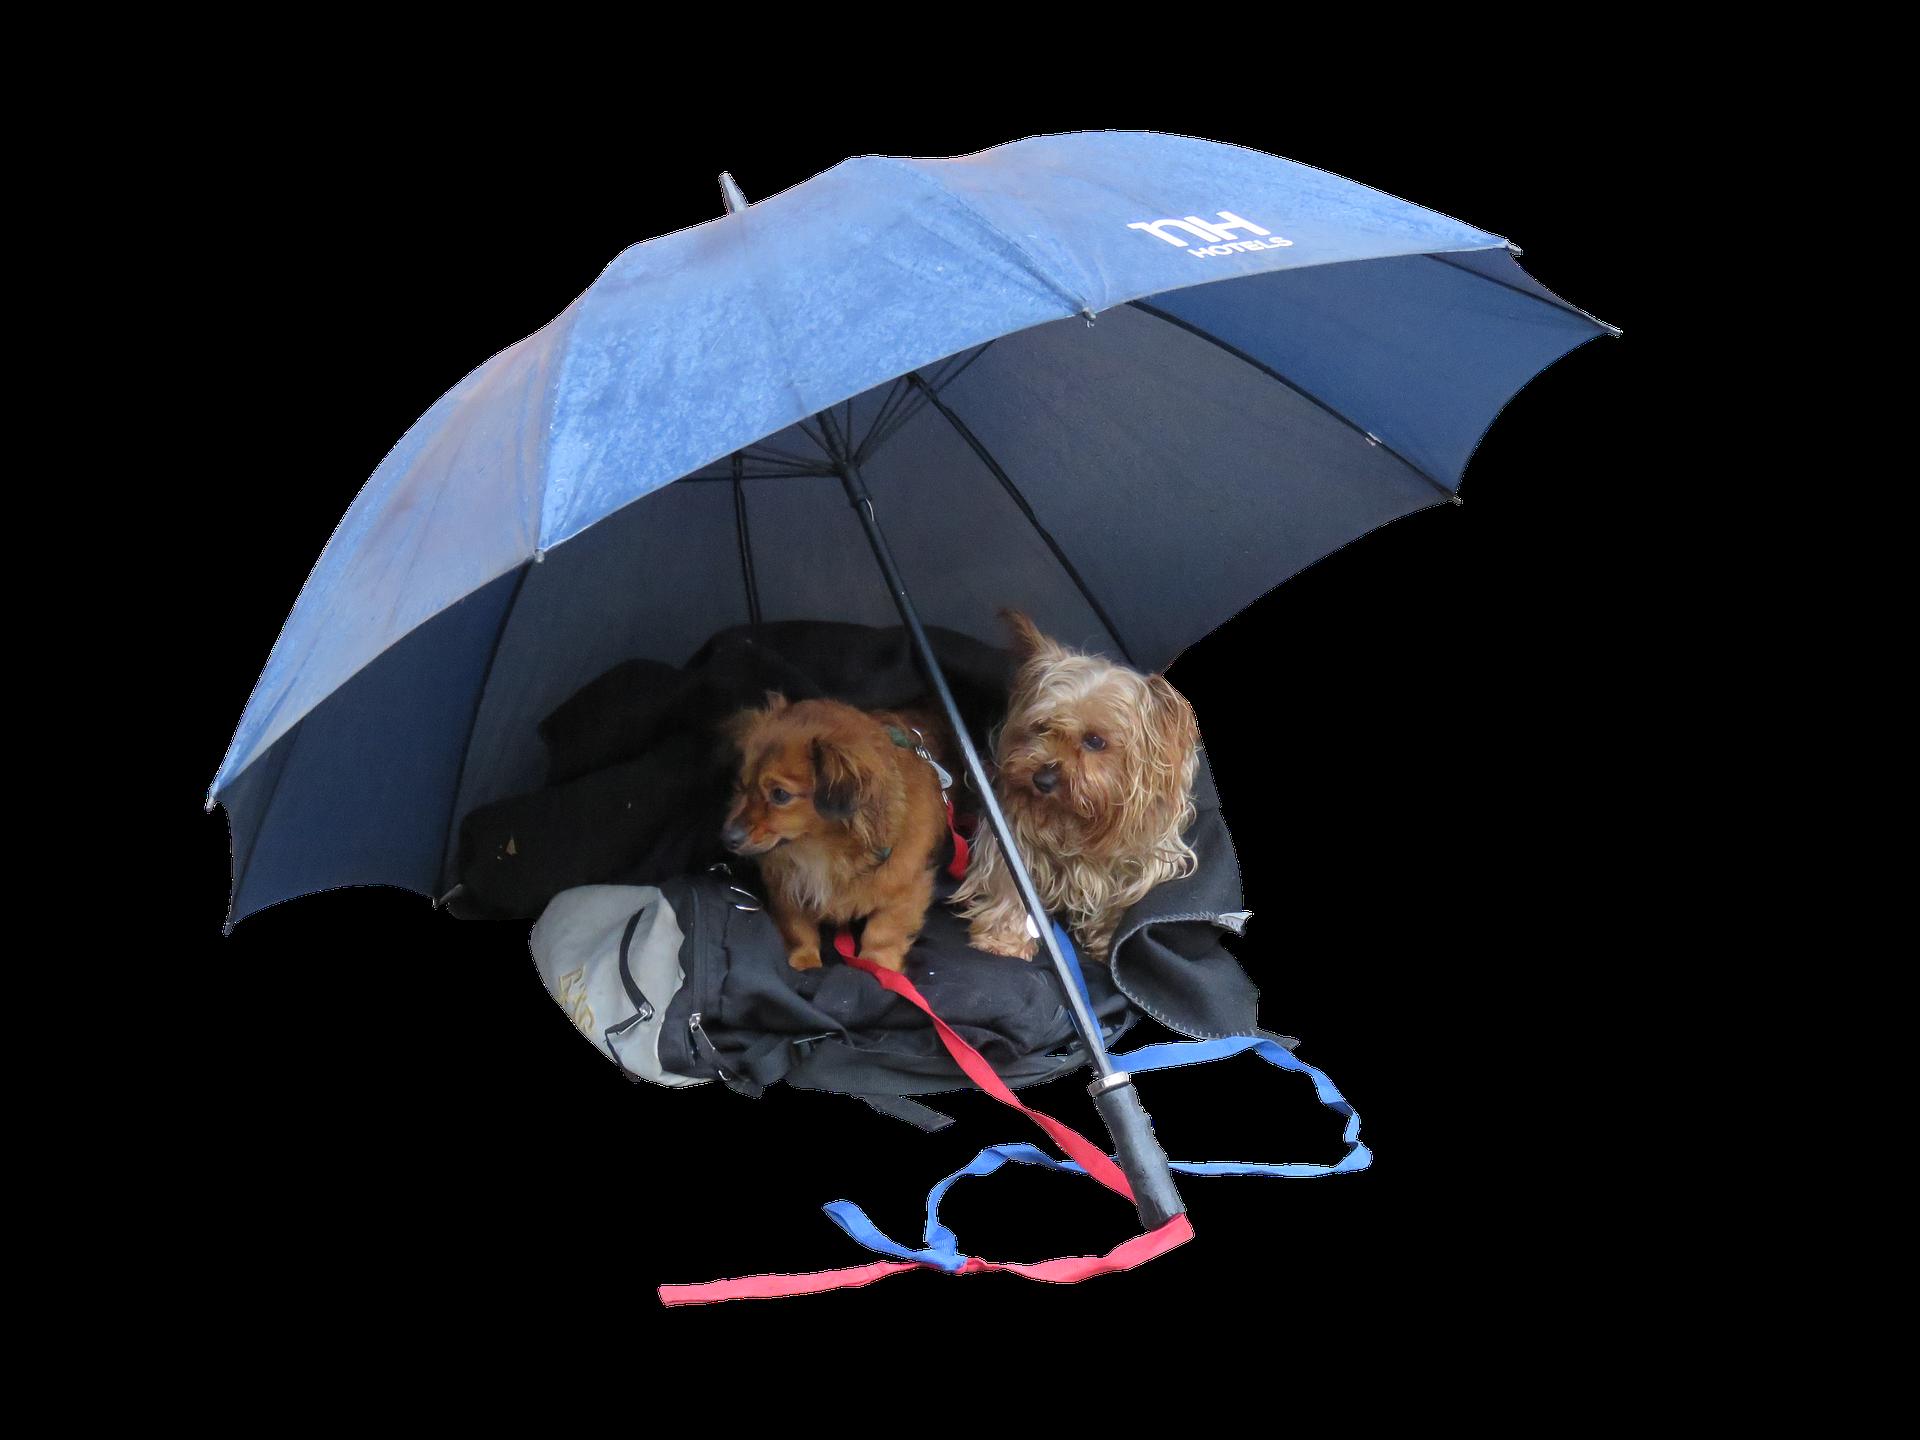 Cute Dogs, Animal, Cute, Dog, Free dog photos, HQ Photo